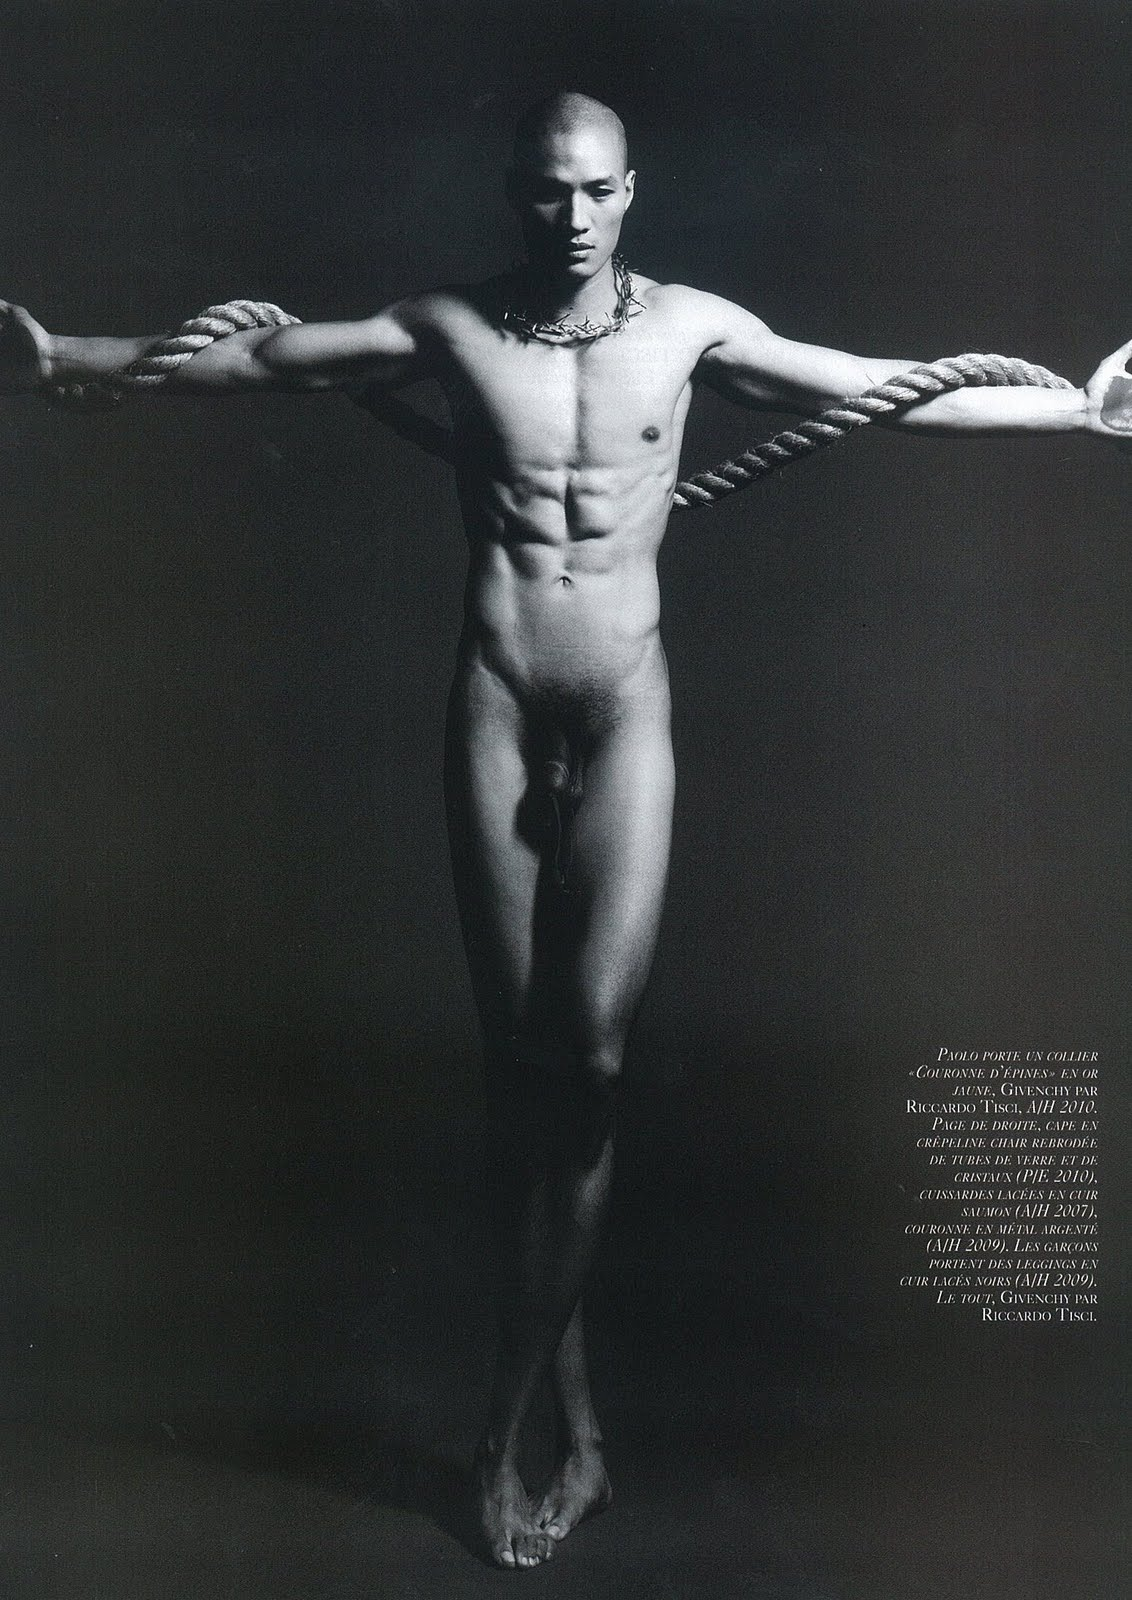 image Nude straight filipino males gay guy